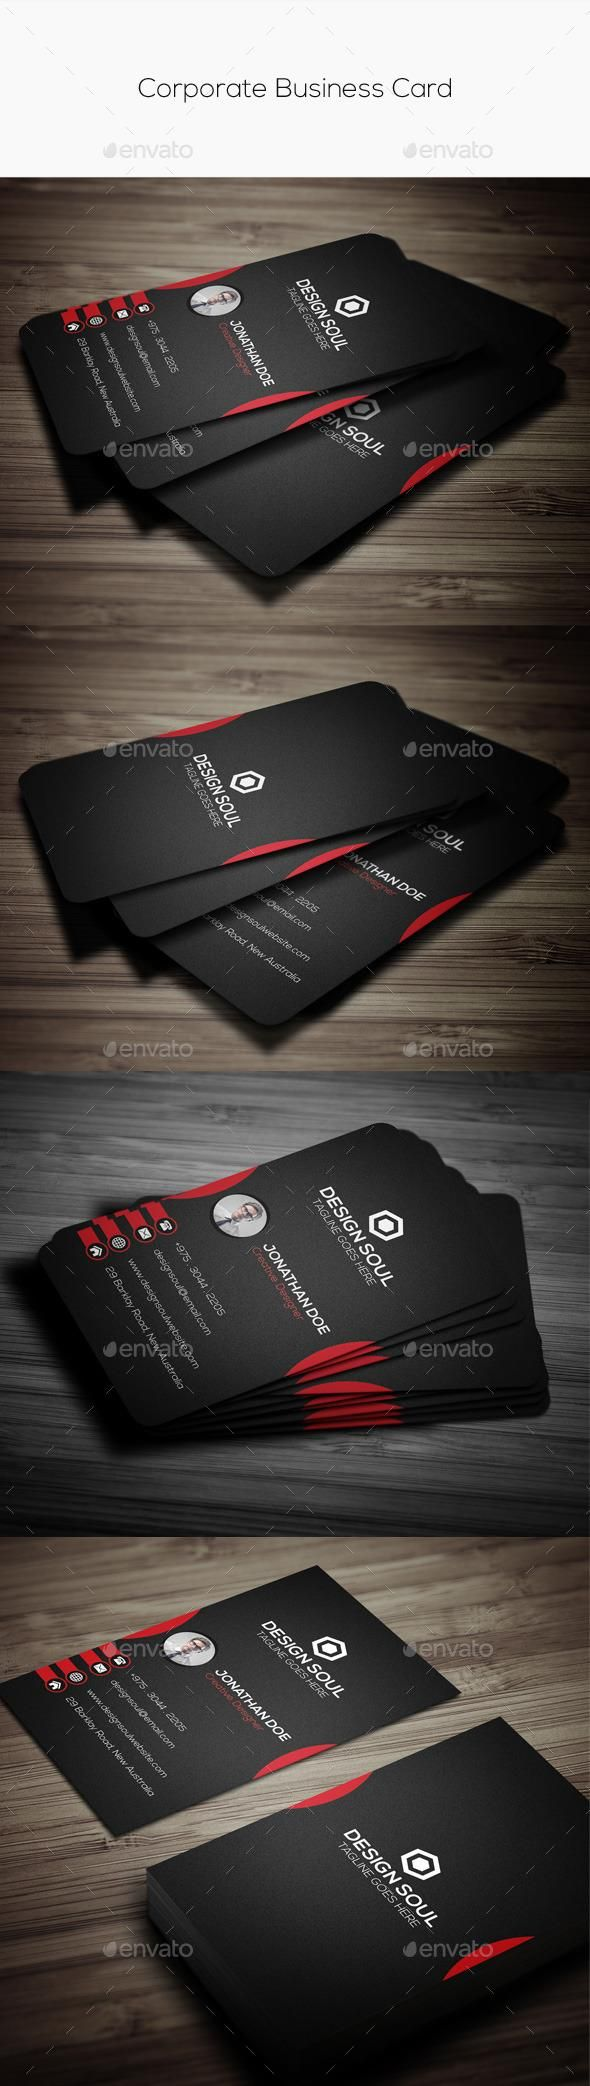 363 best Business Card Design images on Pinterest | Business card ...